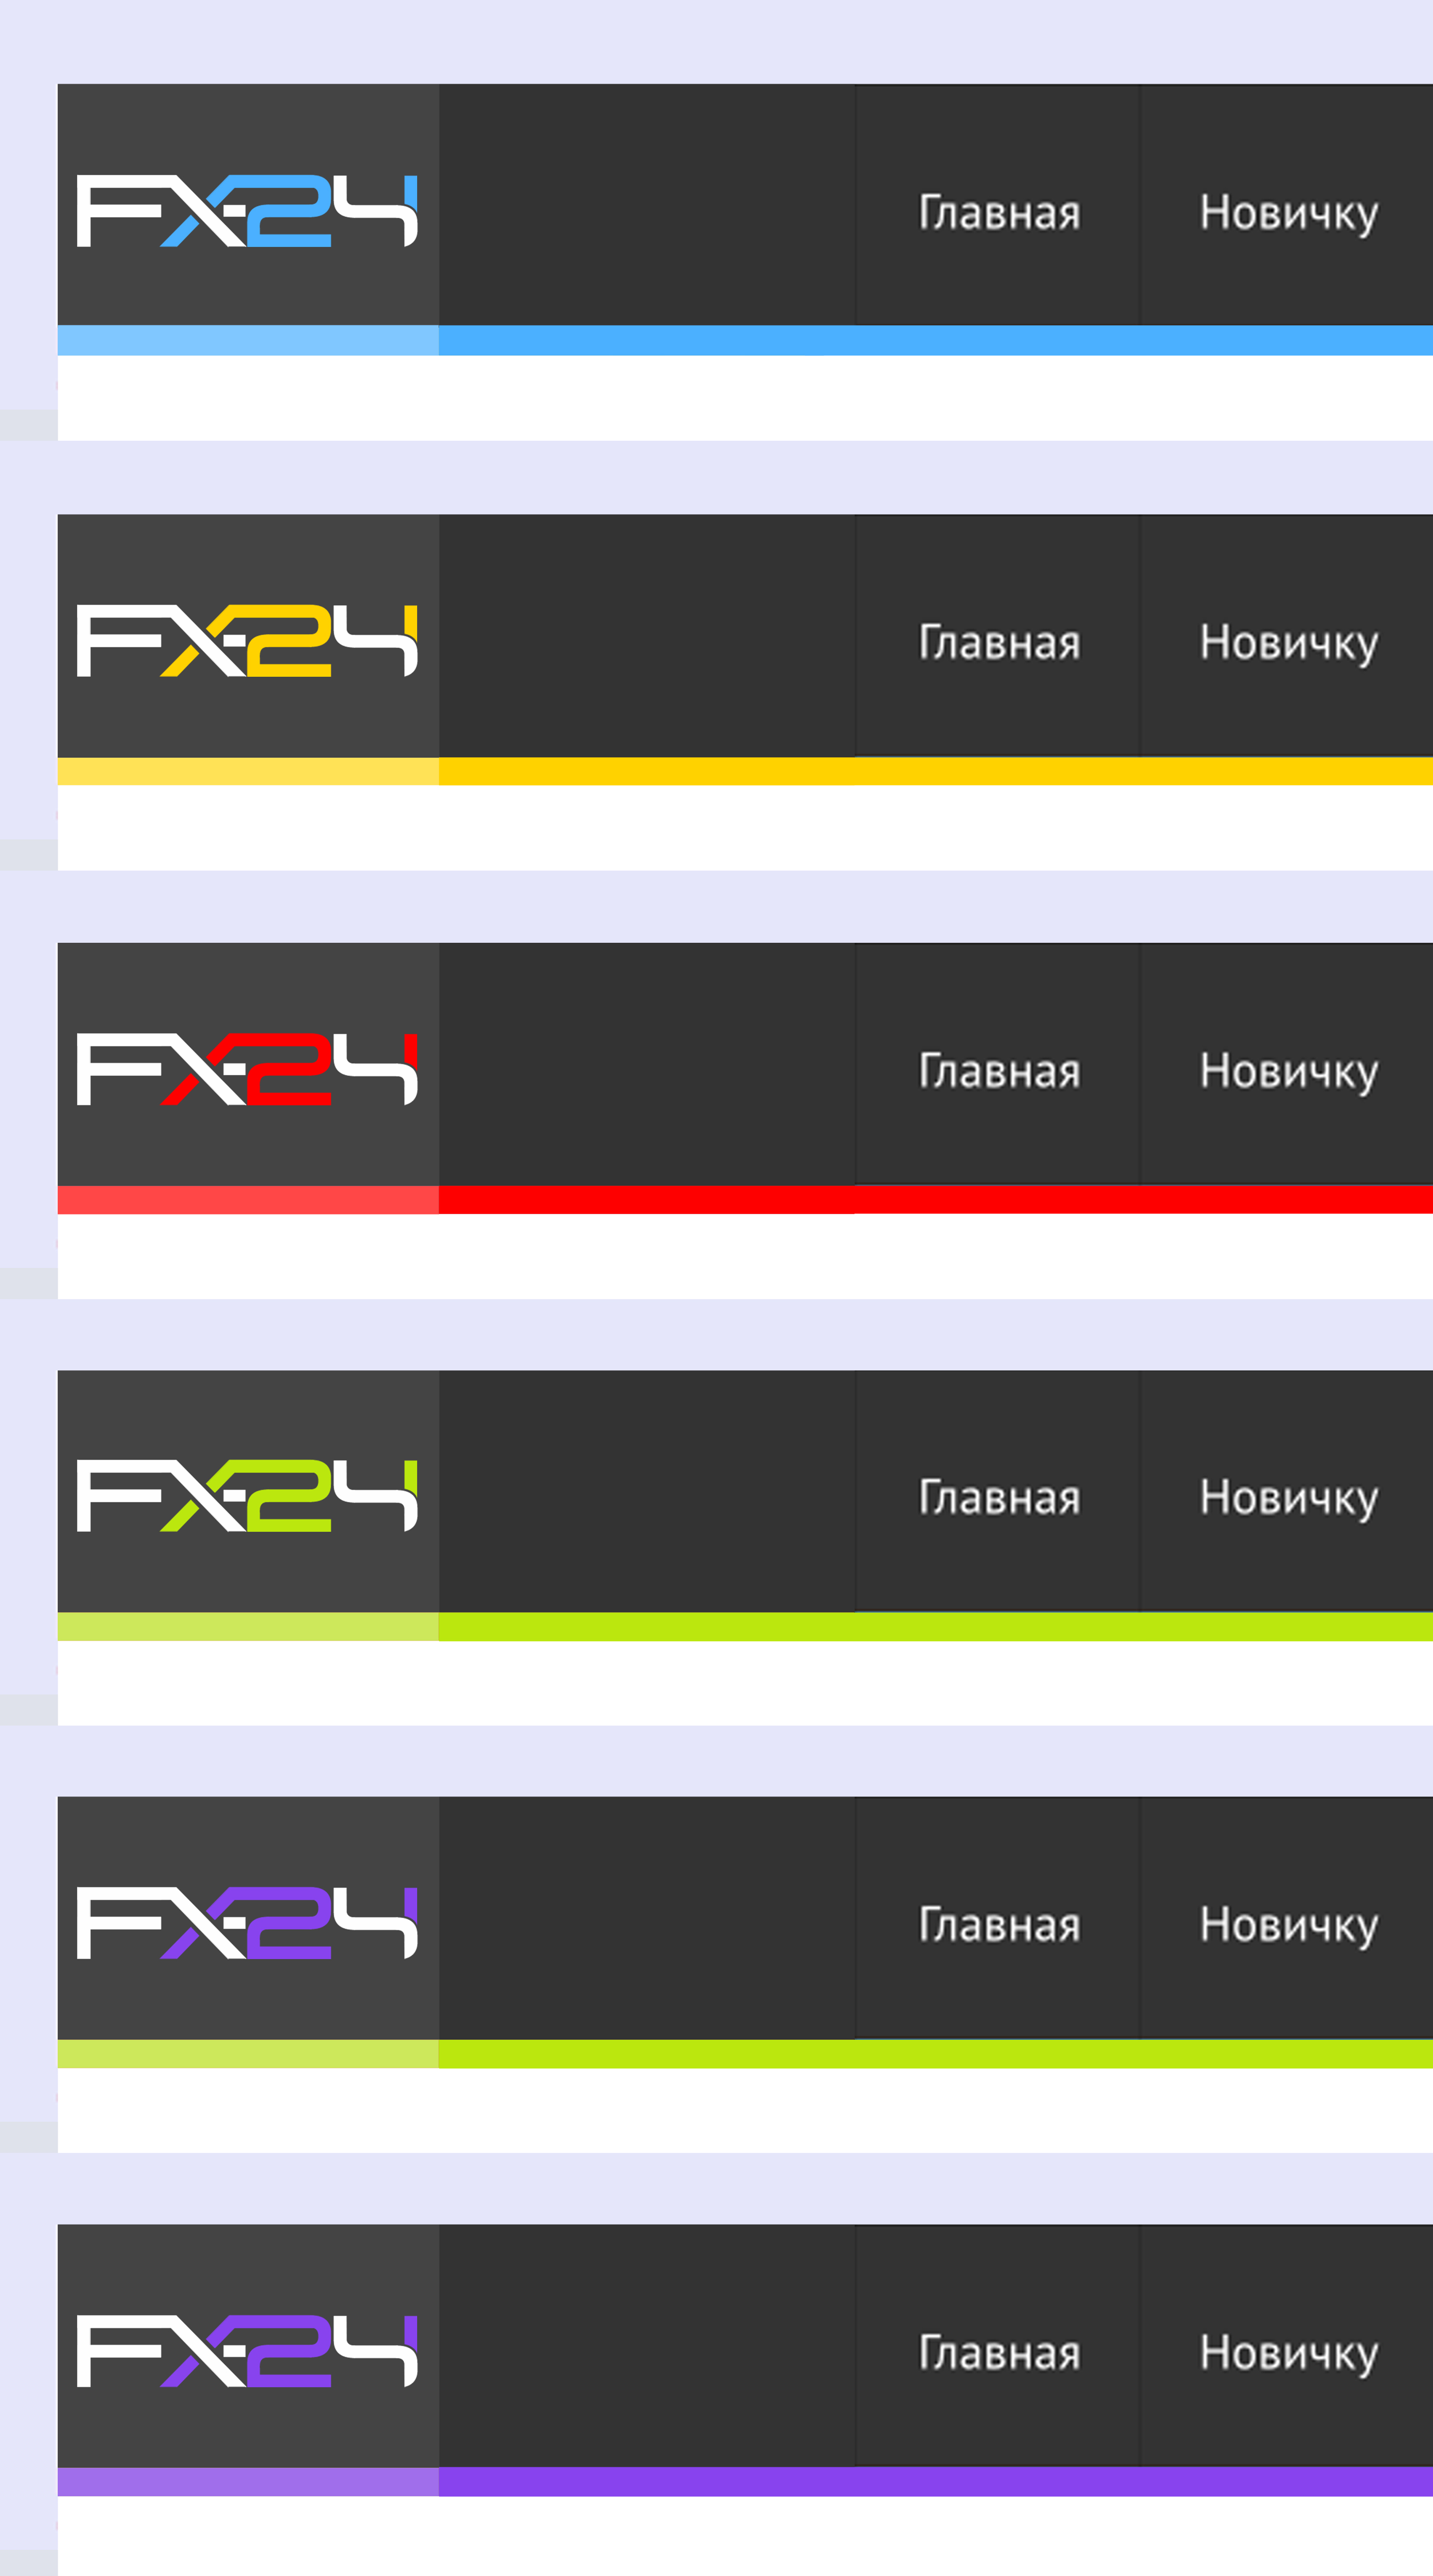 Разработка логотипа компании FX-24 фото f_41150de05fc4606c.jpg